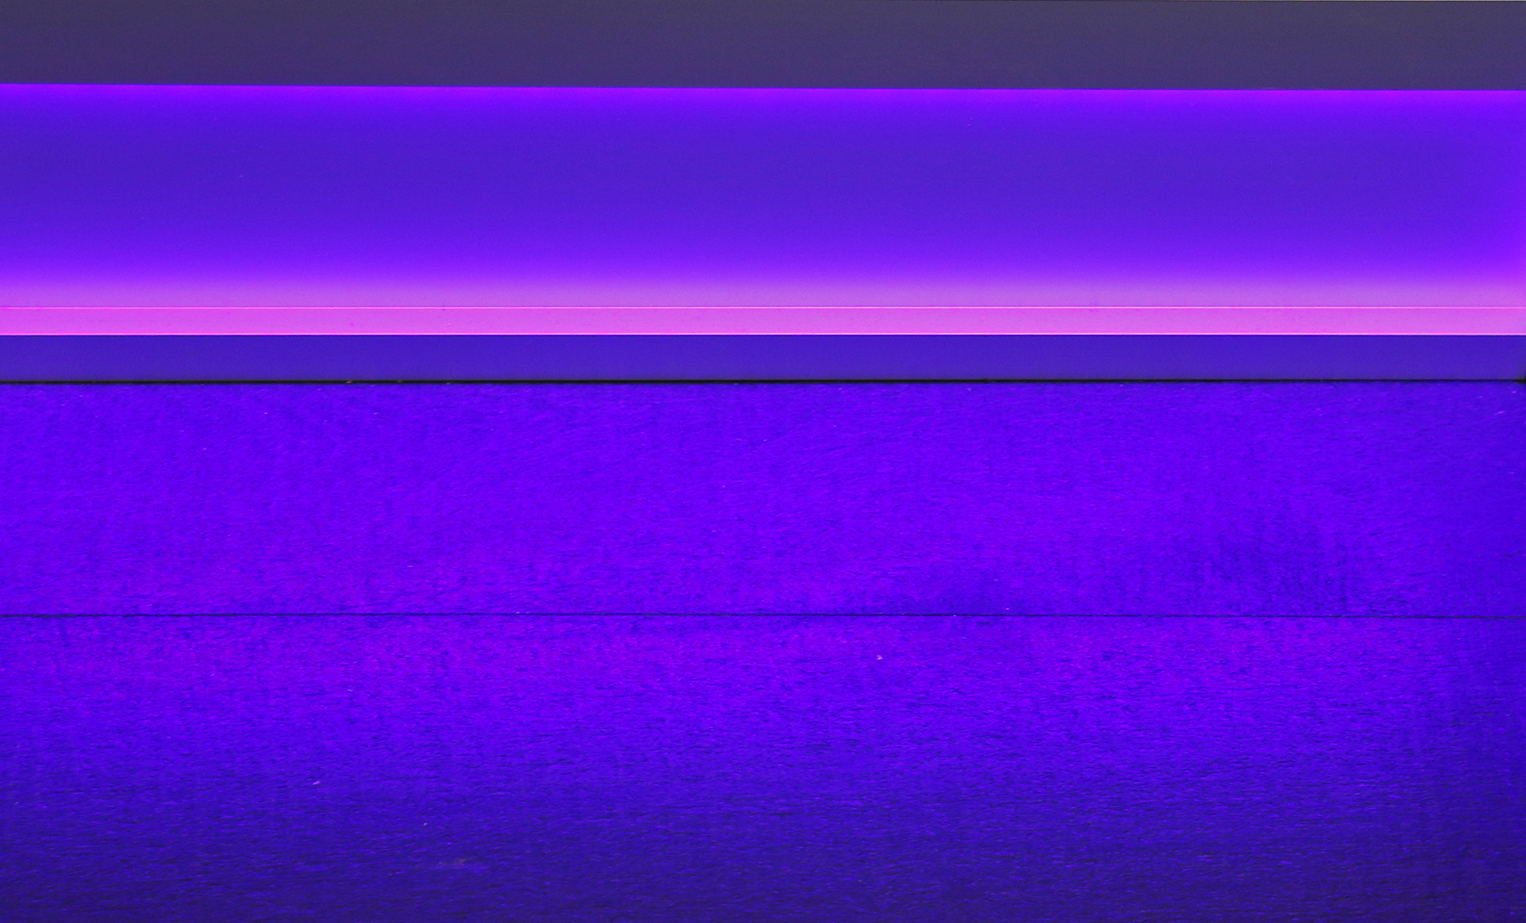 neon-purple-and-pink-led-light-vinson-aluminum-baseboard-1